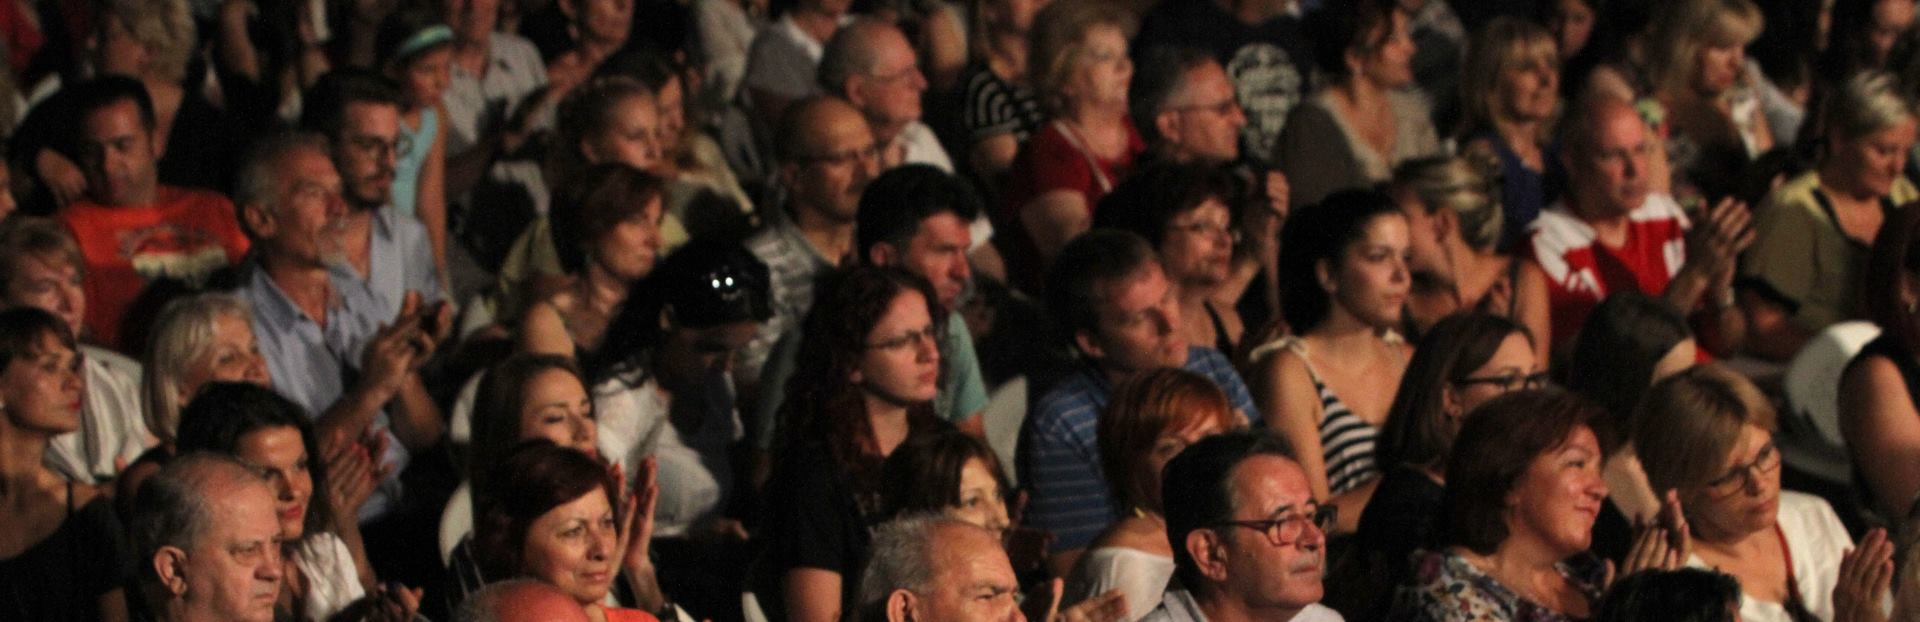 Festival glazbenih dokumentaraca Solo Positivo u Opatiji